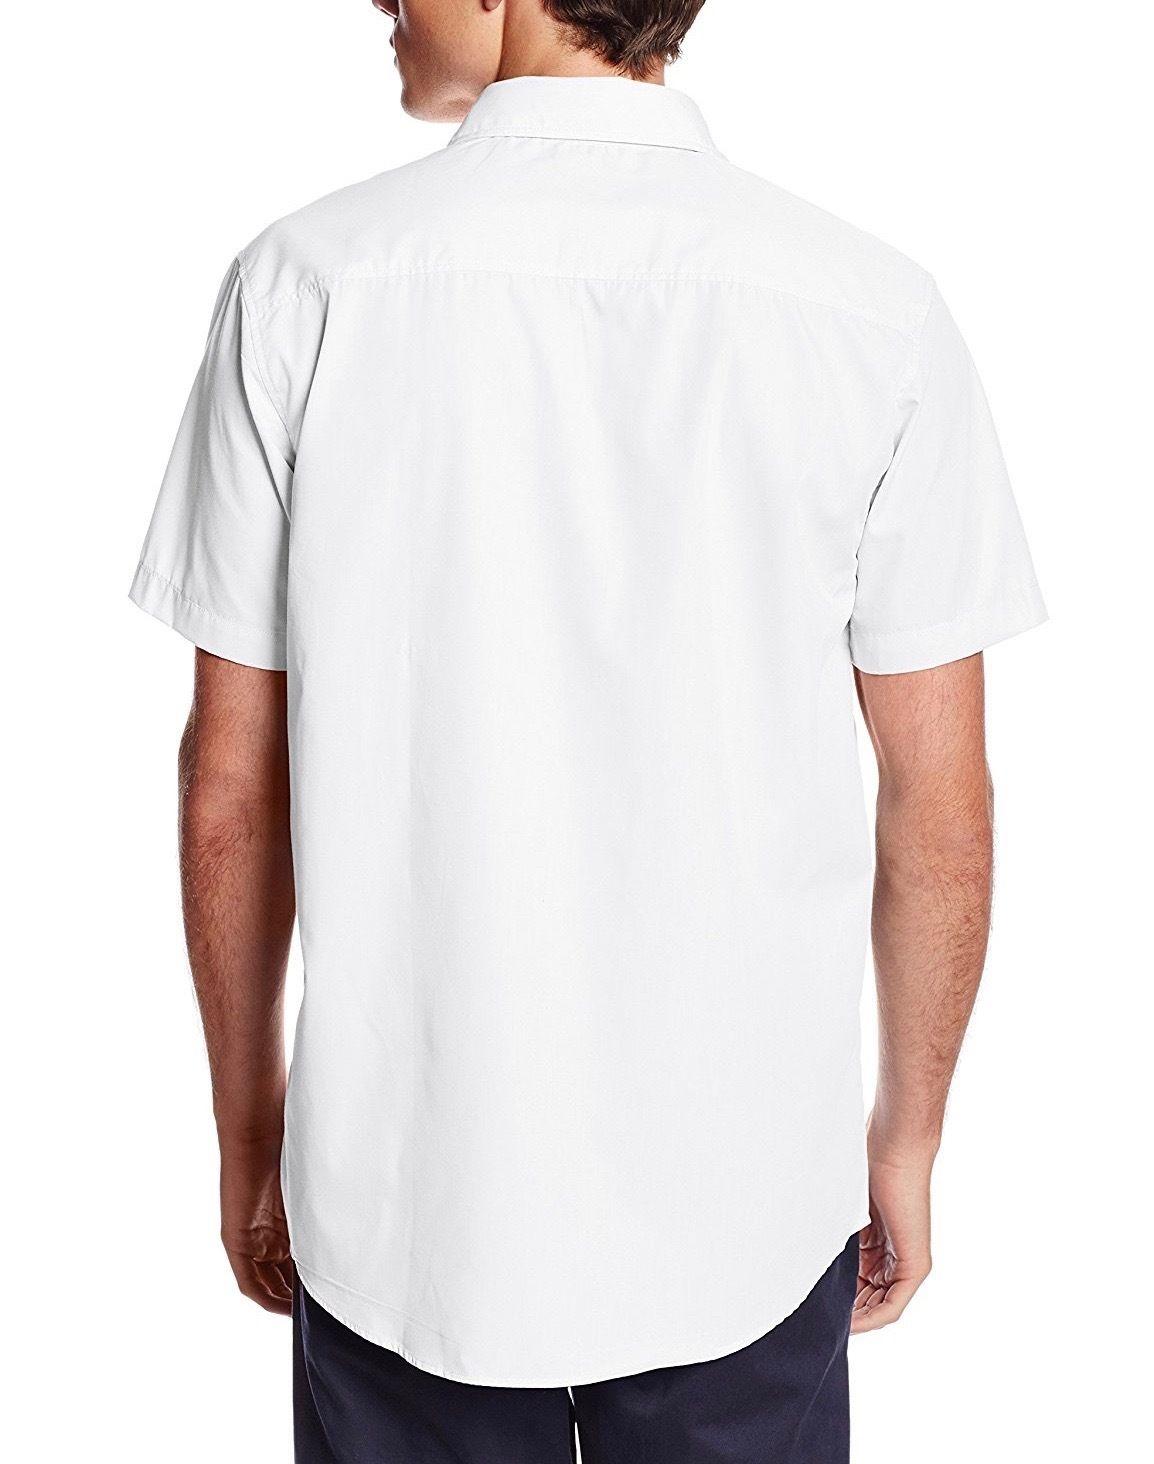 Berlioni-Italy-Men-039-s-Premium-Classic-Button-Down-Short-Sleeve-Solid-Dress-Shirt thumbnail 10